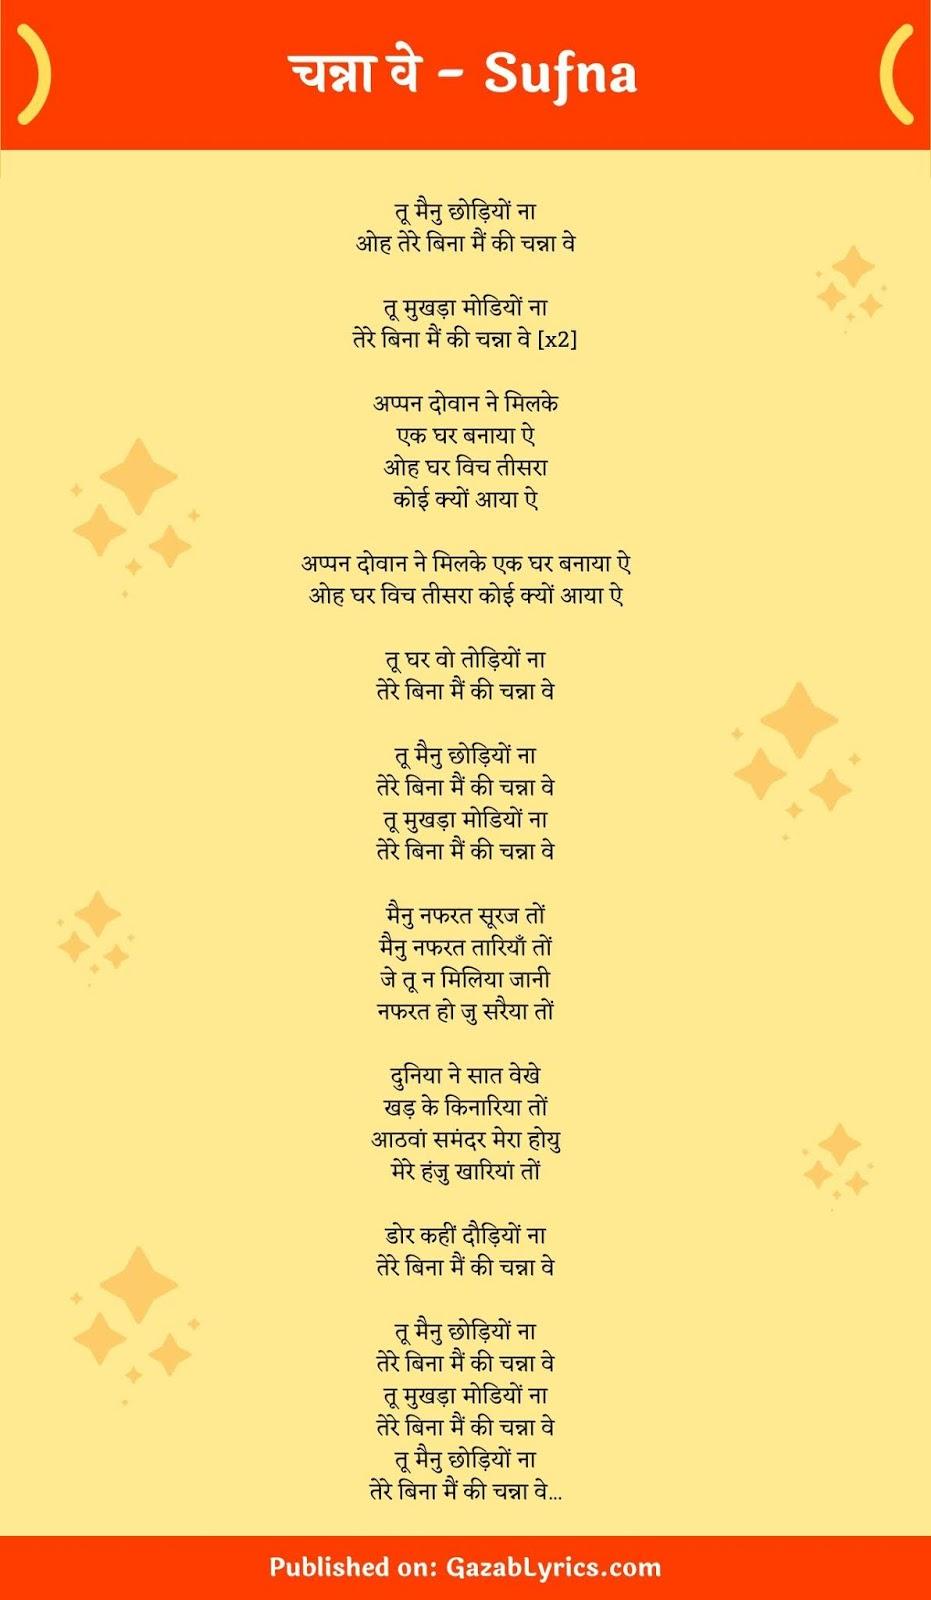 Channa Ve song lyrics image